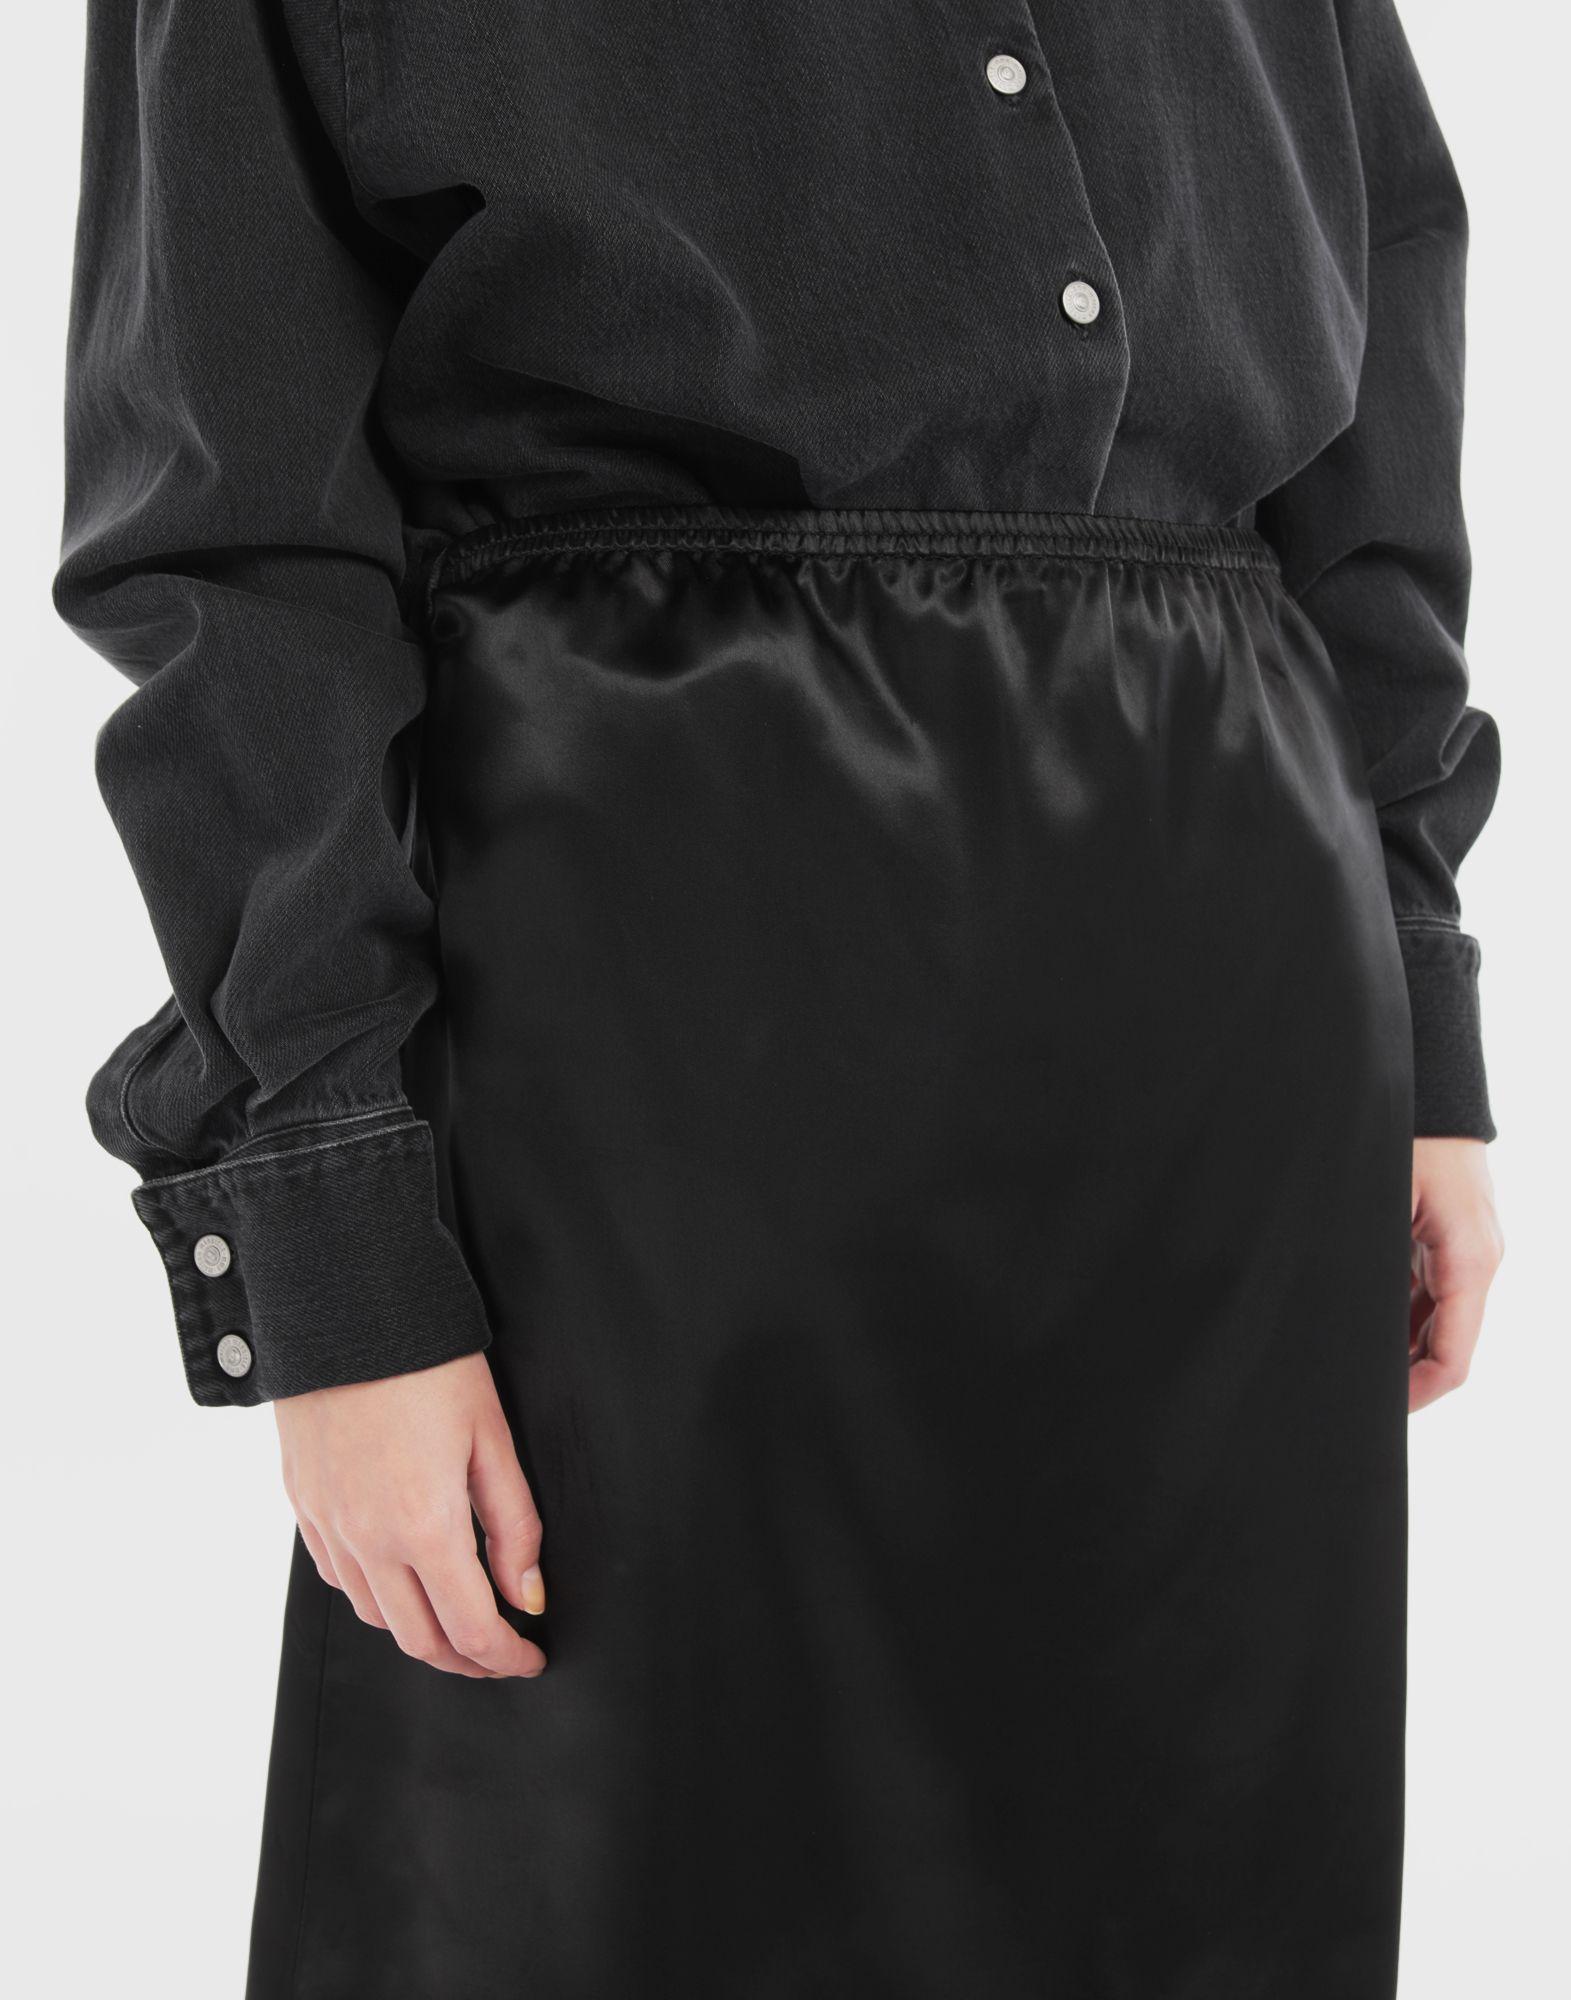 MM6 MAISON MARGIELA Multi-wear spliced shirt-dress Dress Woman b